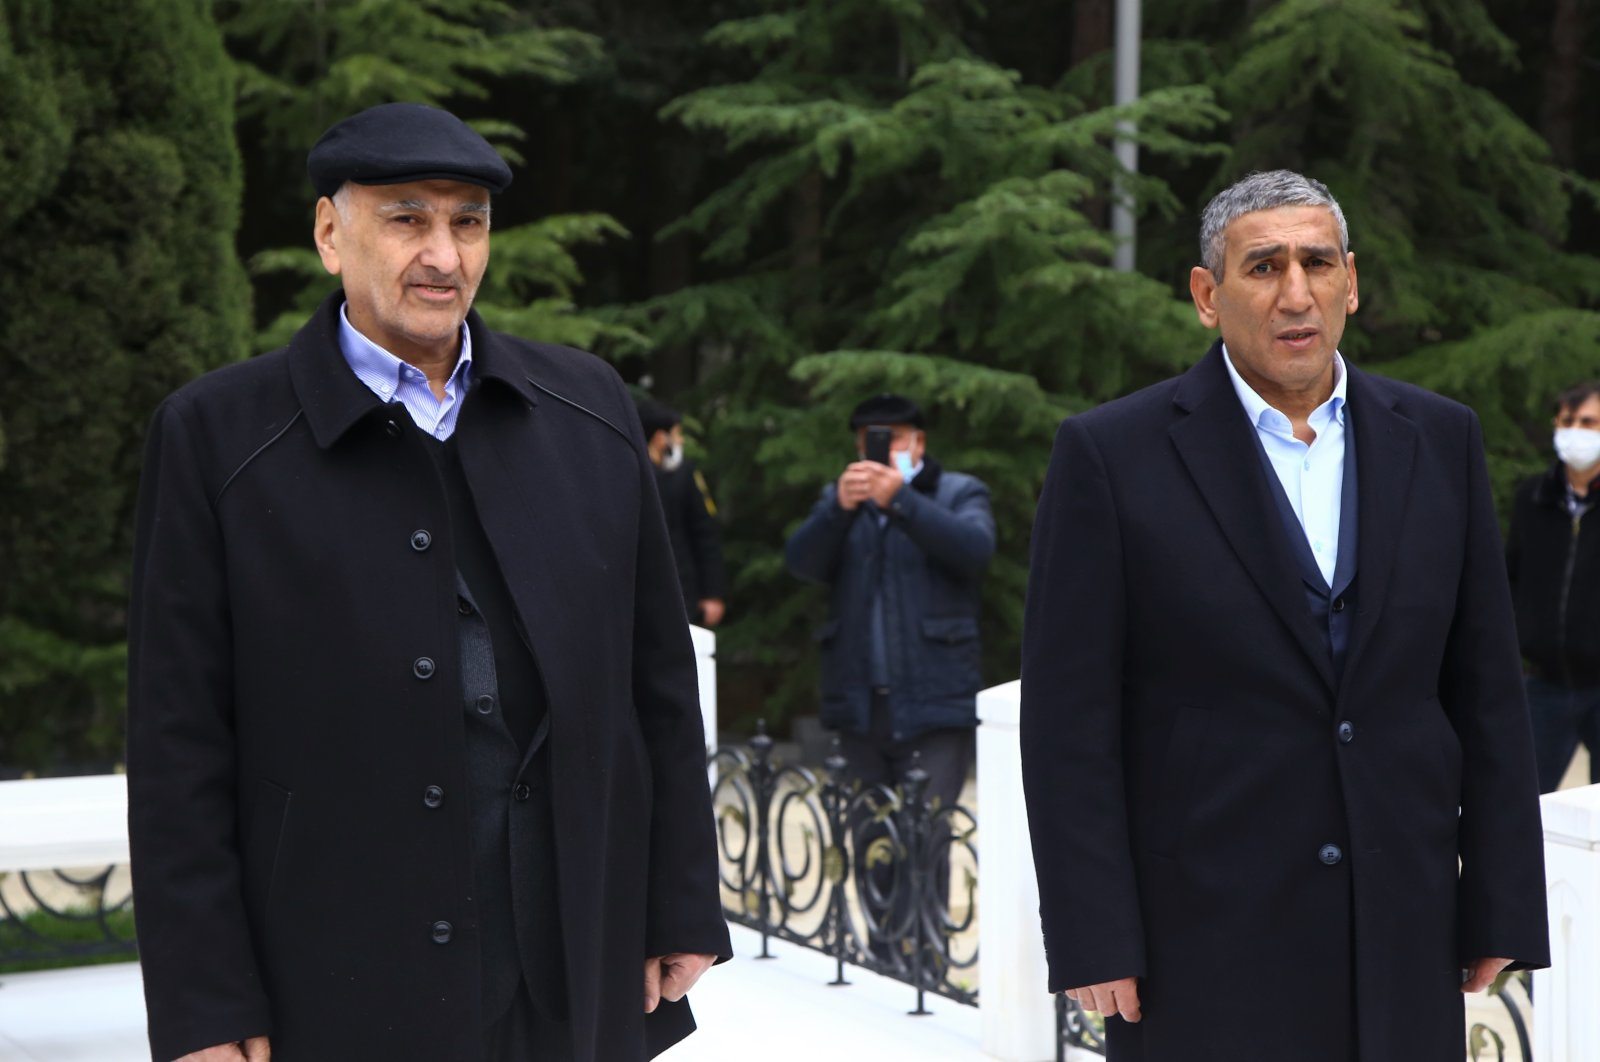 Şahbaz Guliyev (R) and Dilgam Esgerov (L) pictured in the Azerbaijani city of Baku on Jan. 1, 2020 (AA Photo)